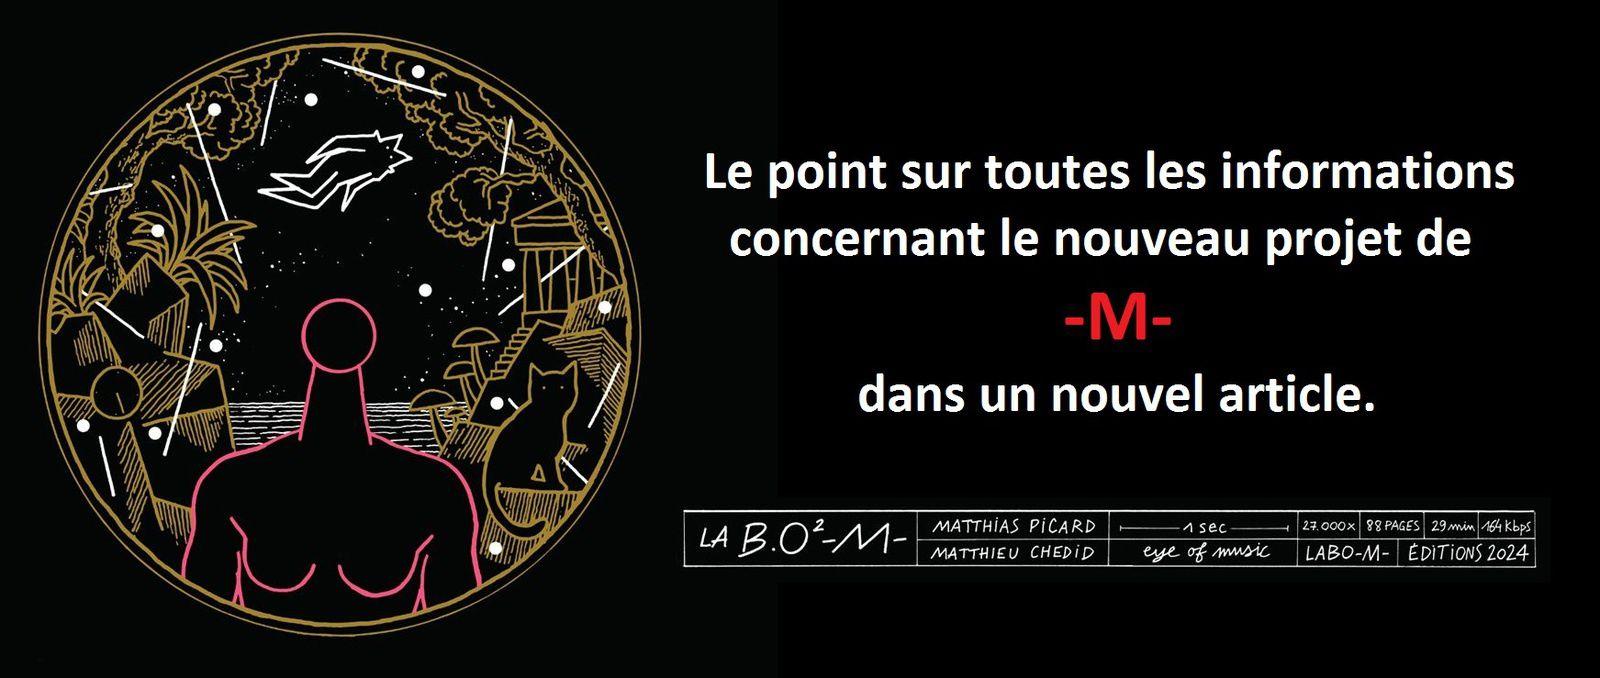 MATTHIEU CHEDID - A propos de La B.O ² -M- (son nouvel album)